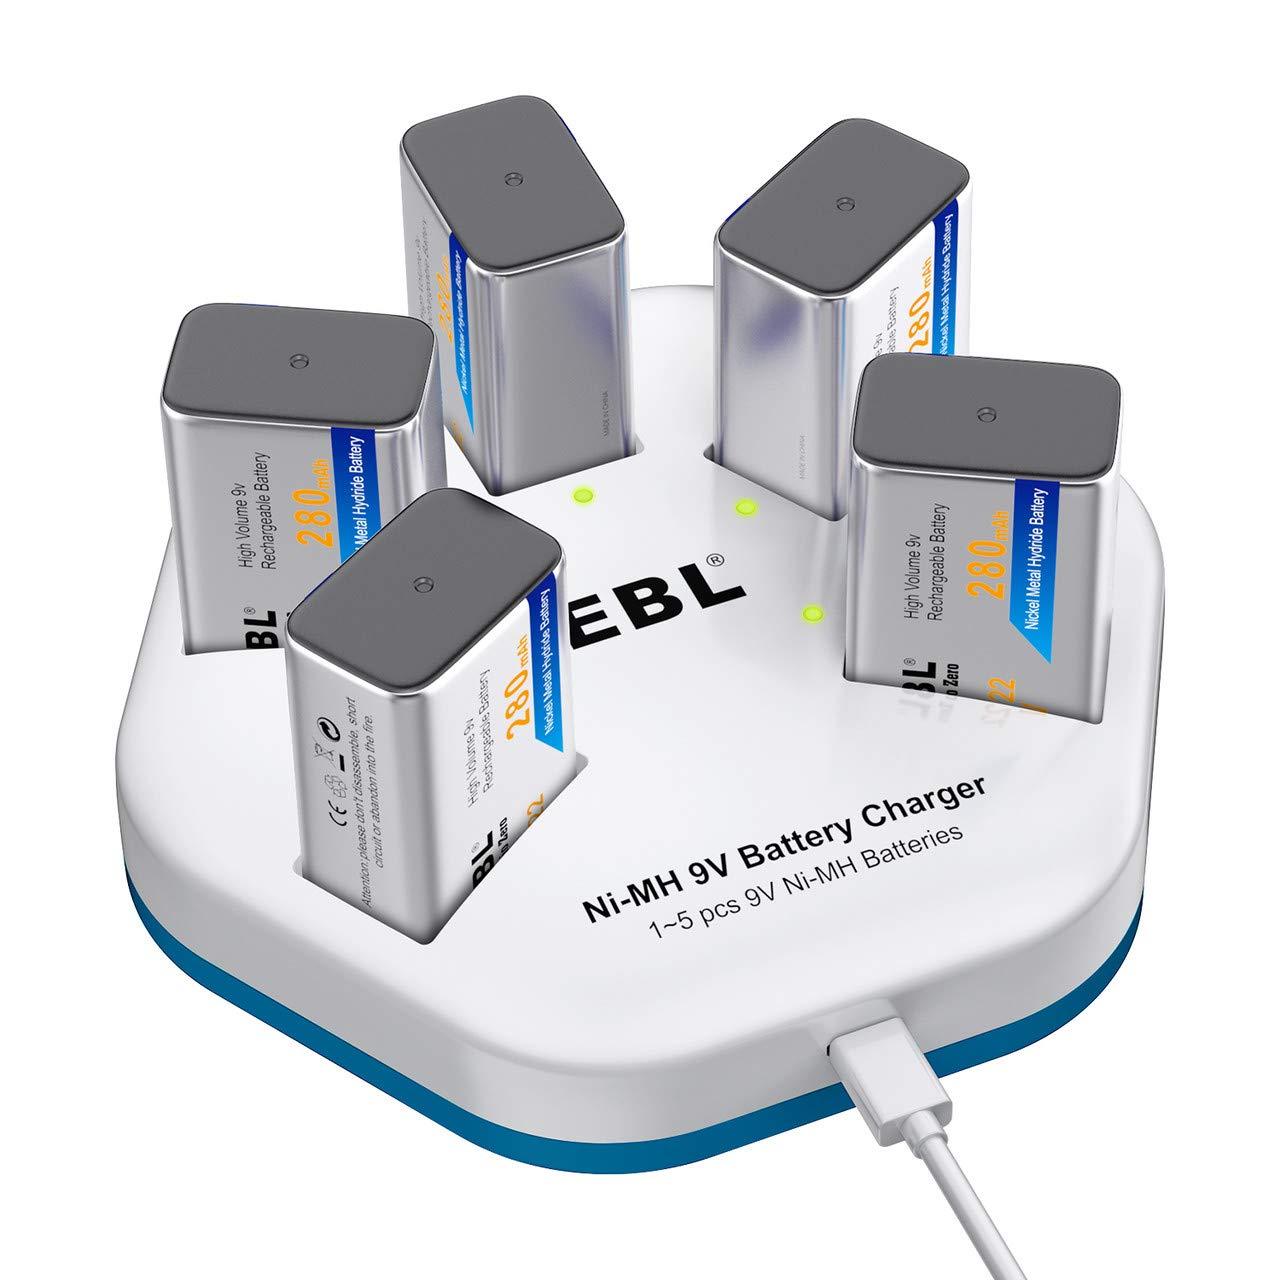 EBL 9V Akku 280mAh 5 Stücke Typ NI-MH 9volt Block Batterien mit 9v Ladegerät, USB Aufladung, 5-Ladeplatz, LED Anzeige